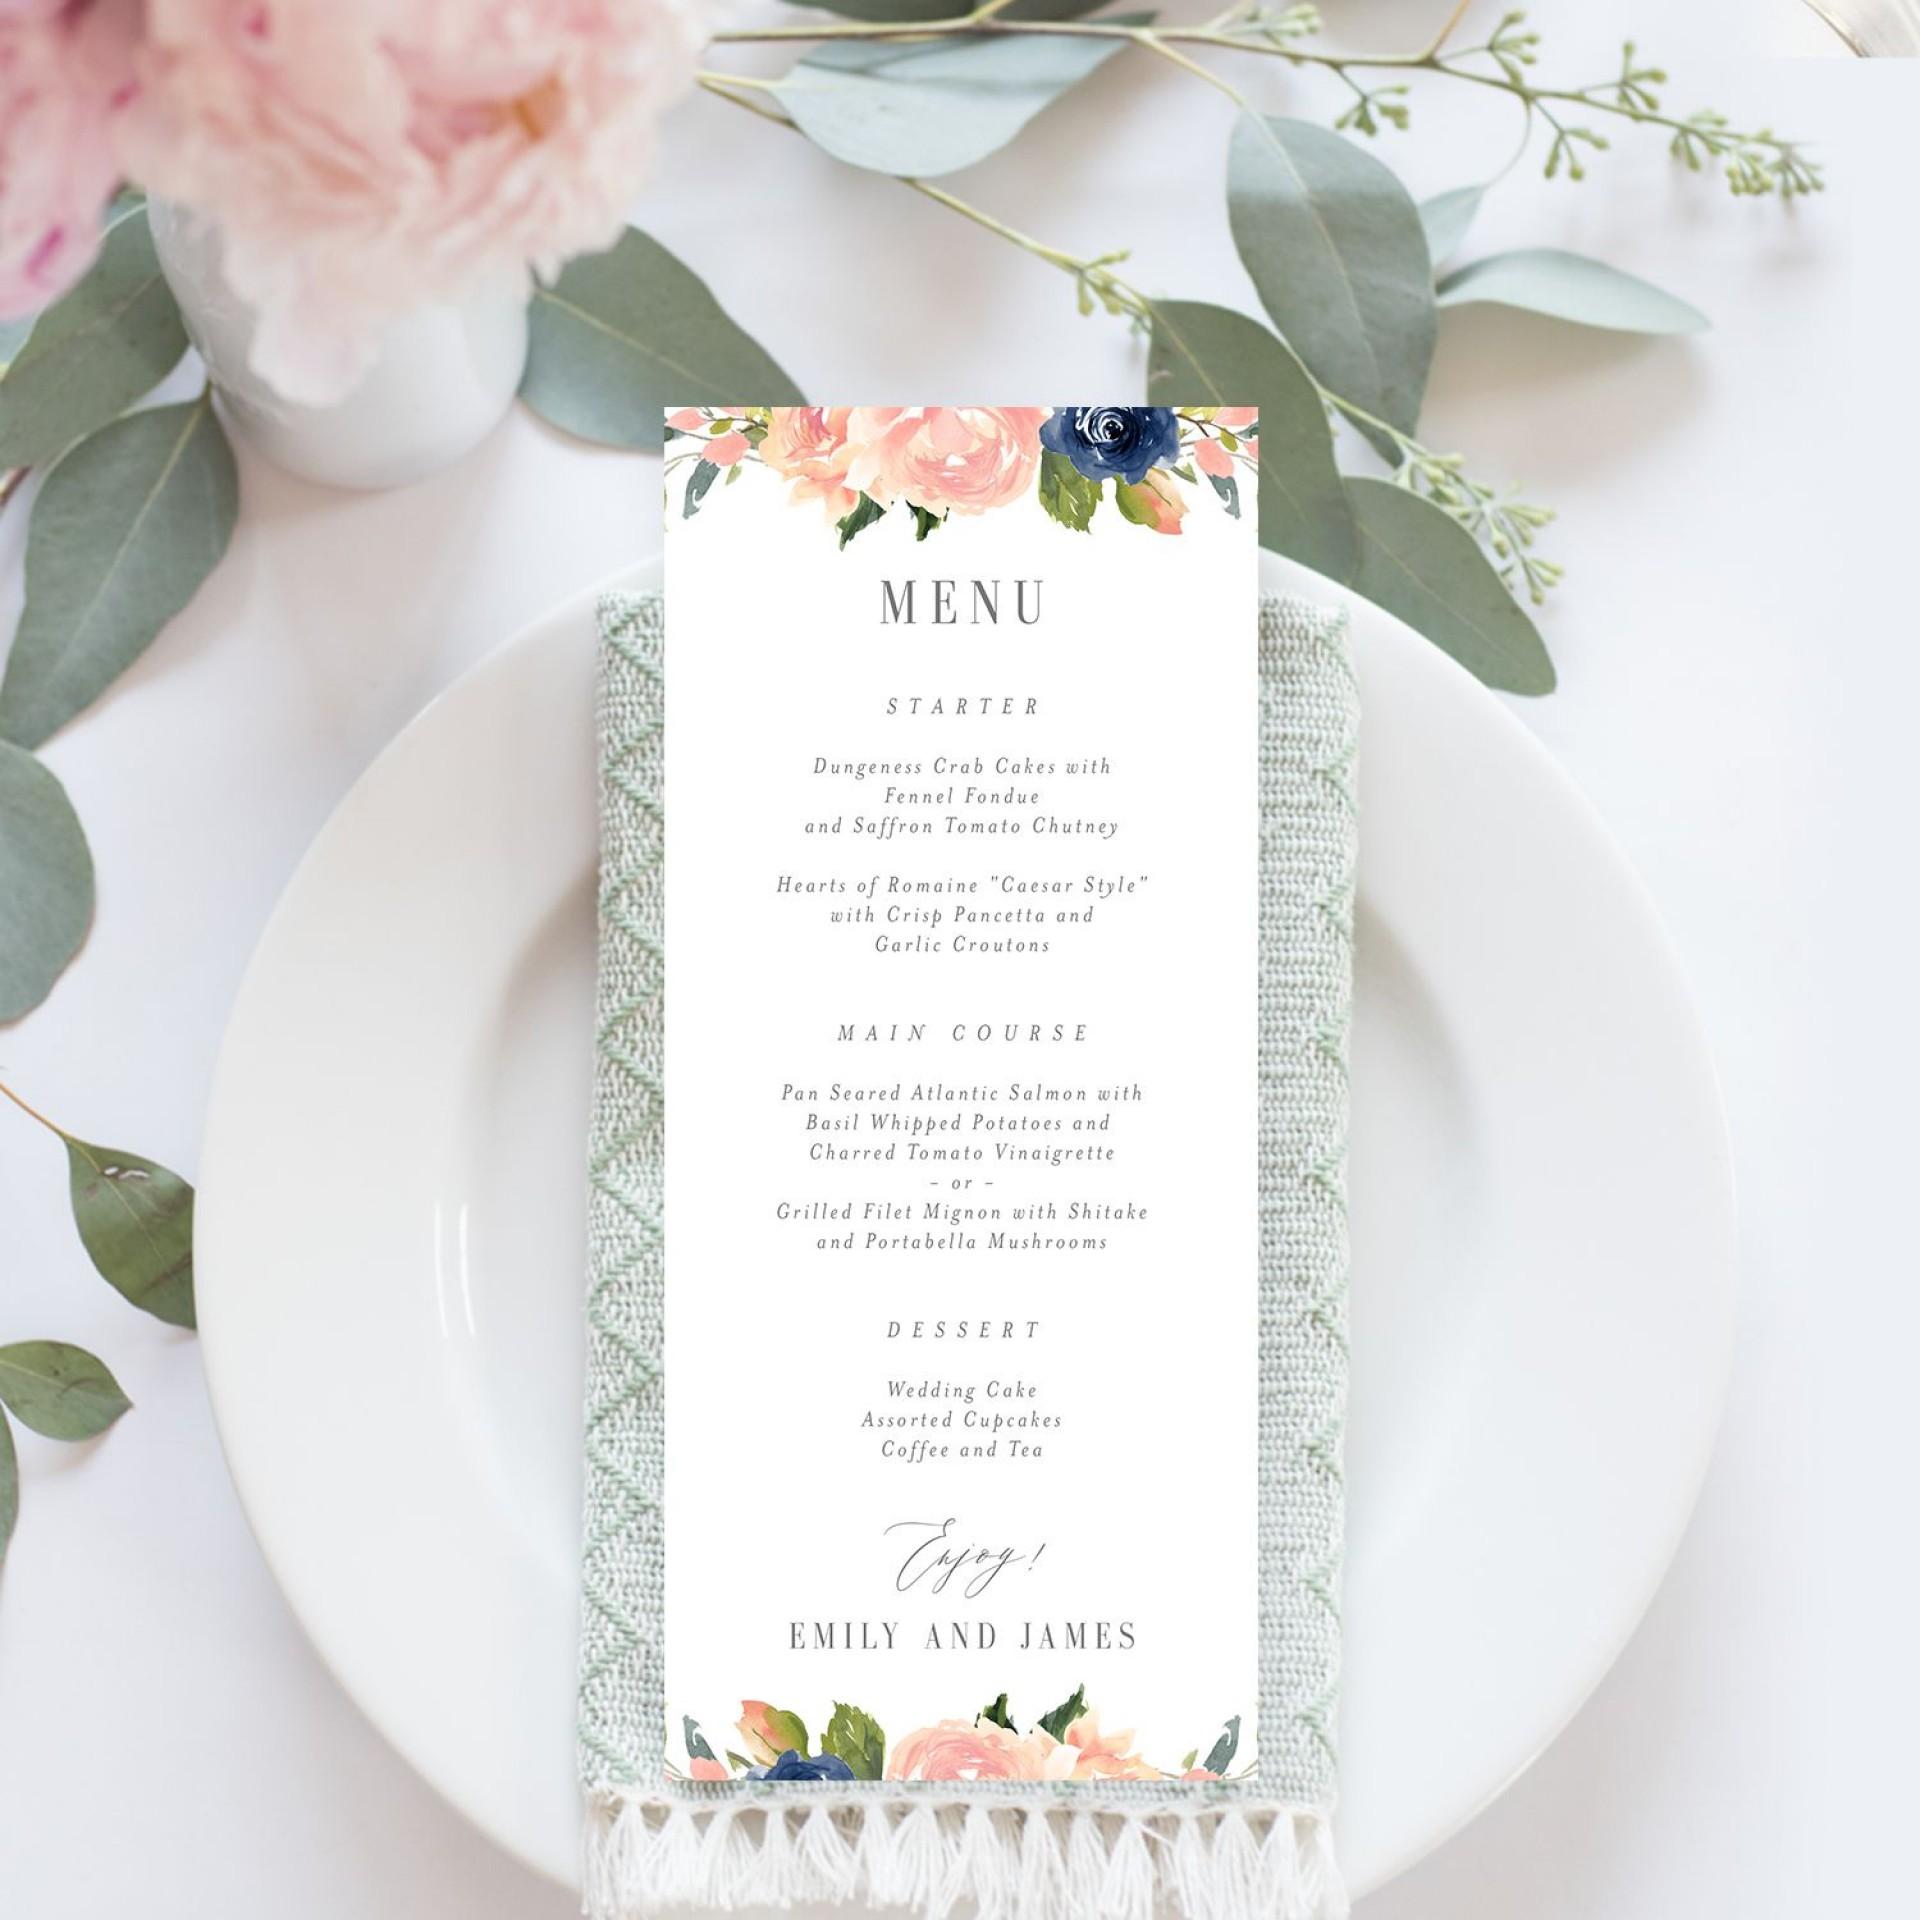 008 Impressive Free Printable Wedding Menu Card Template Example  Templates1920